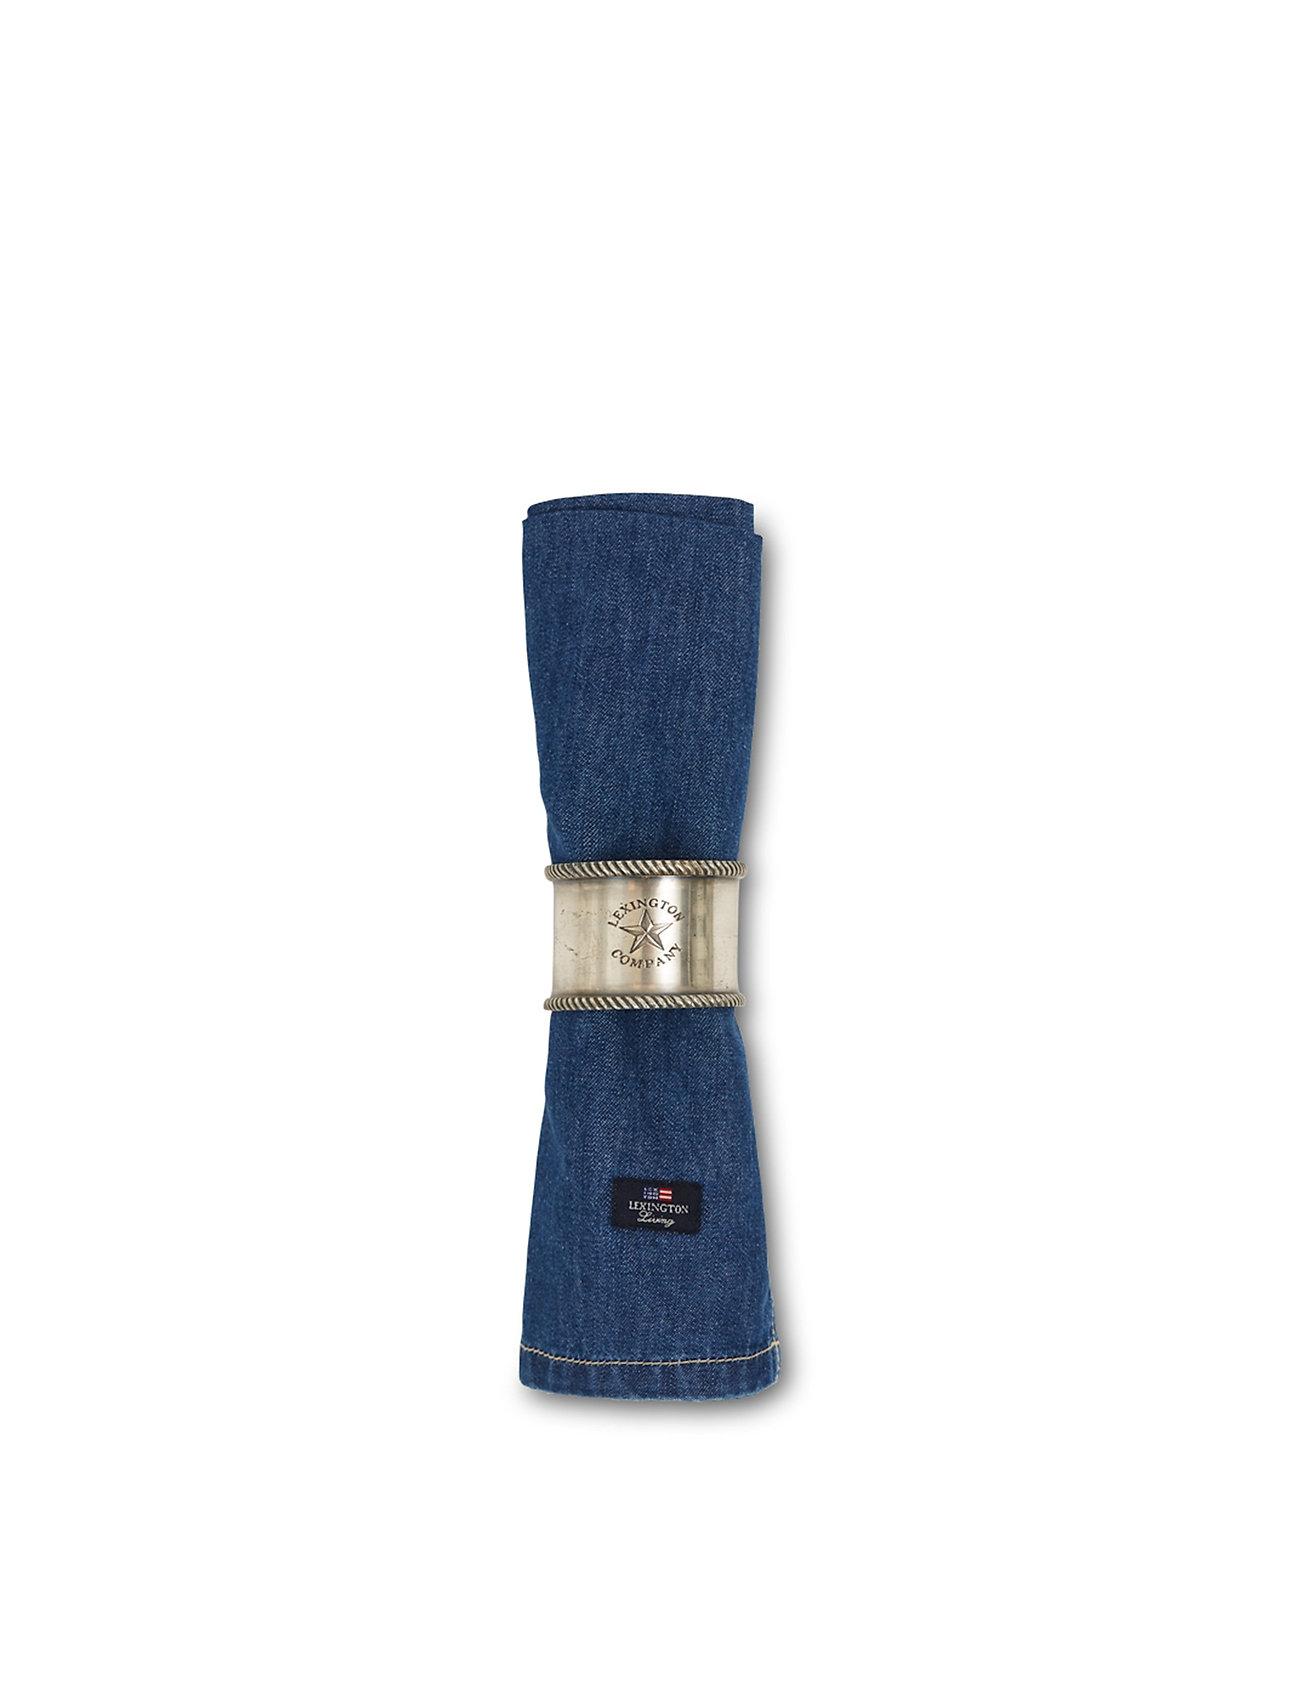 Lexington Home - Icons Cotton Twill Denim Napkin - pöytätabletit - denim blue - 1